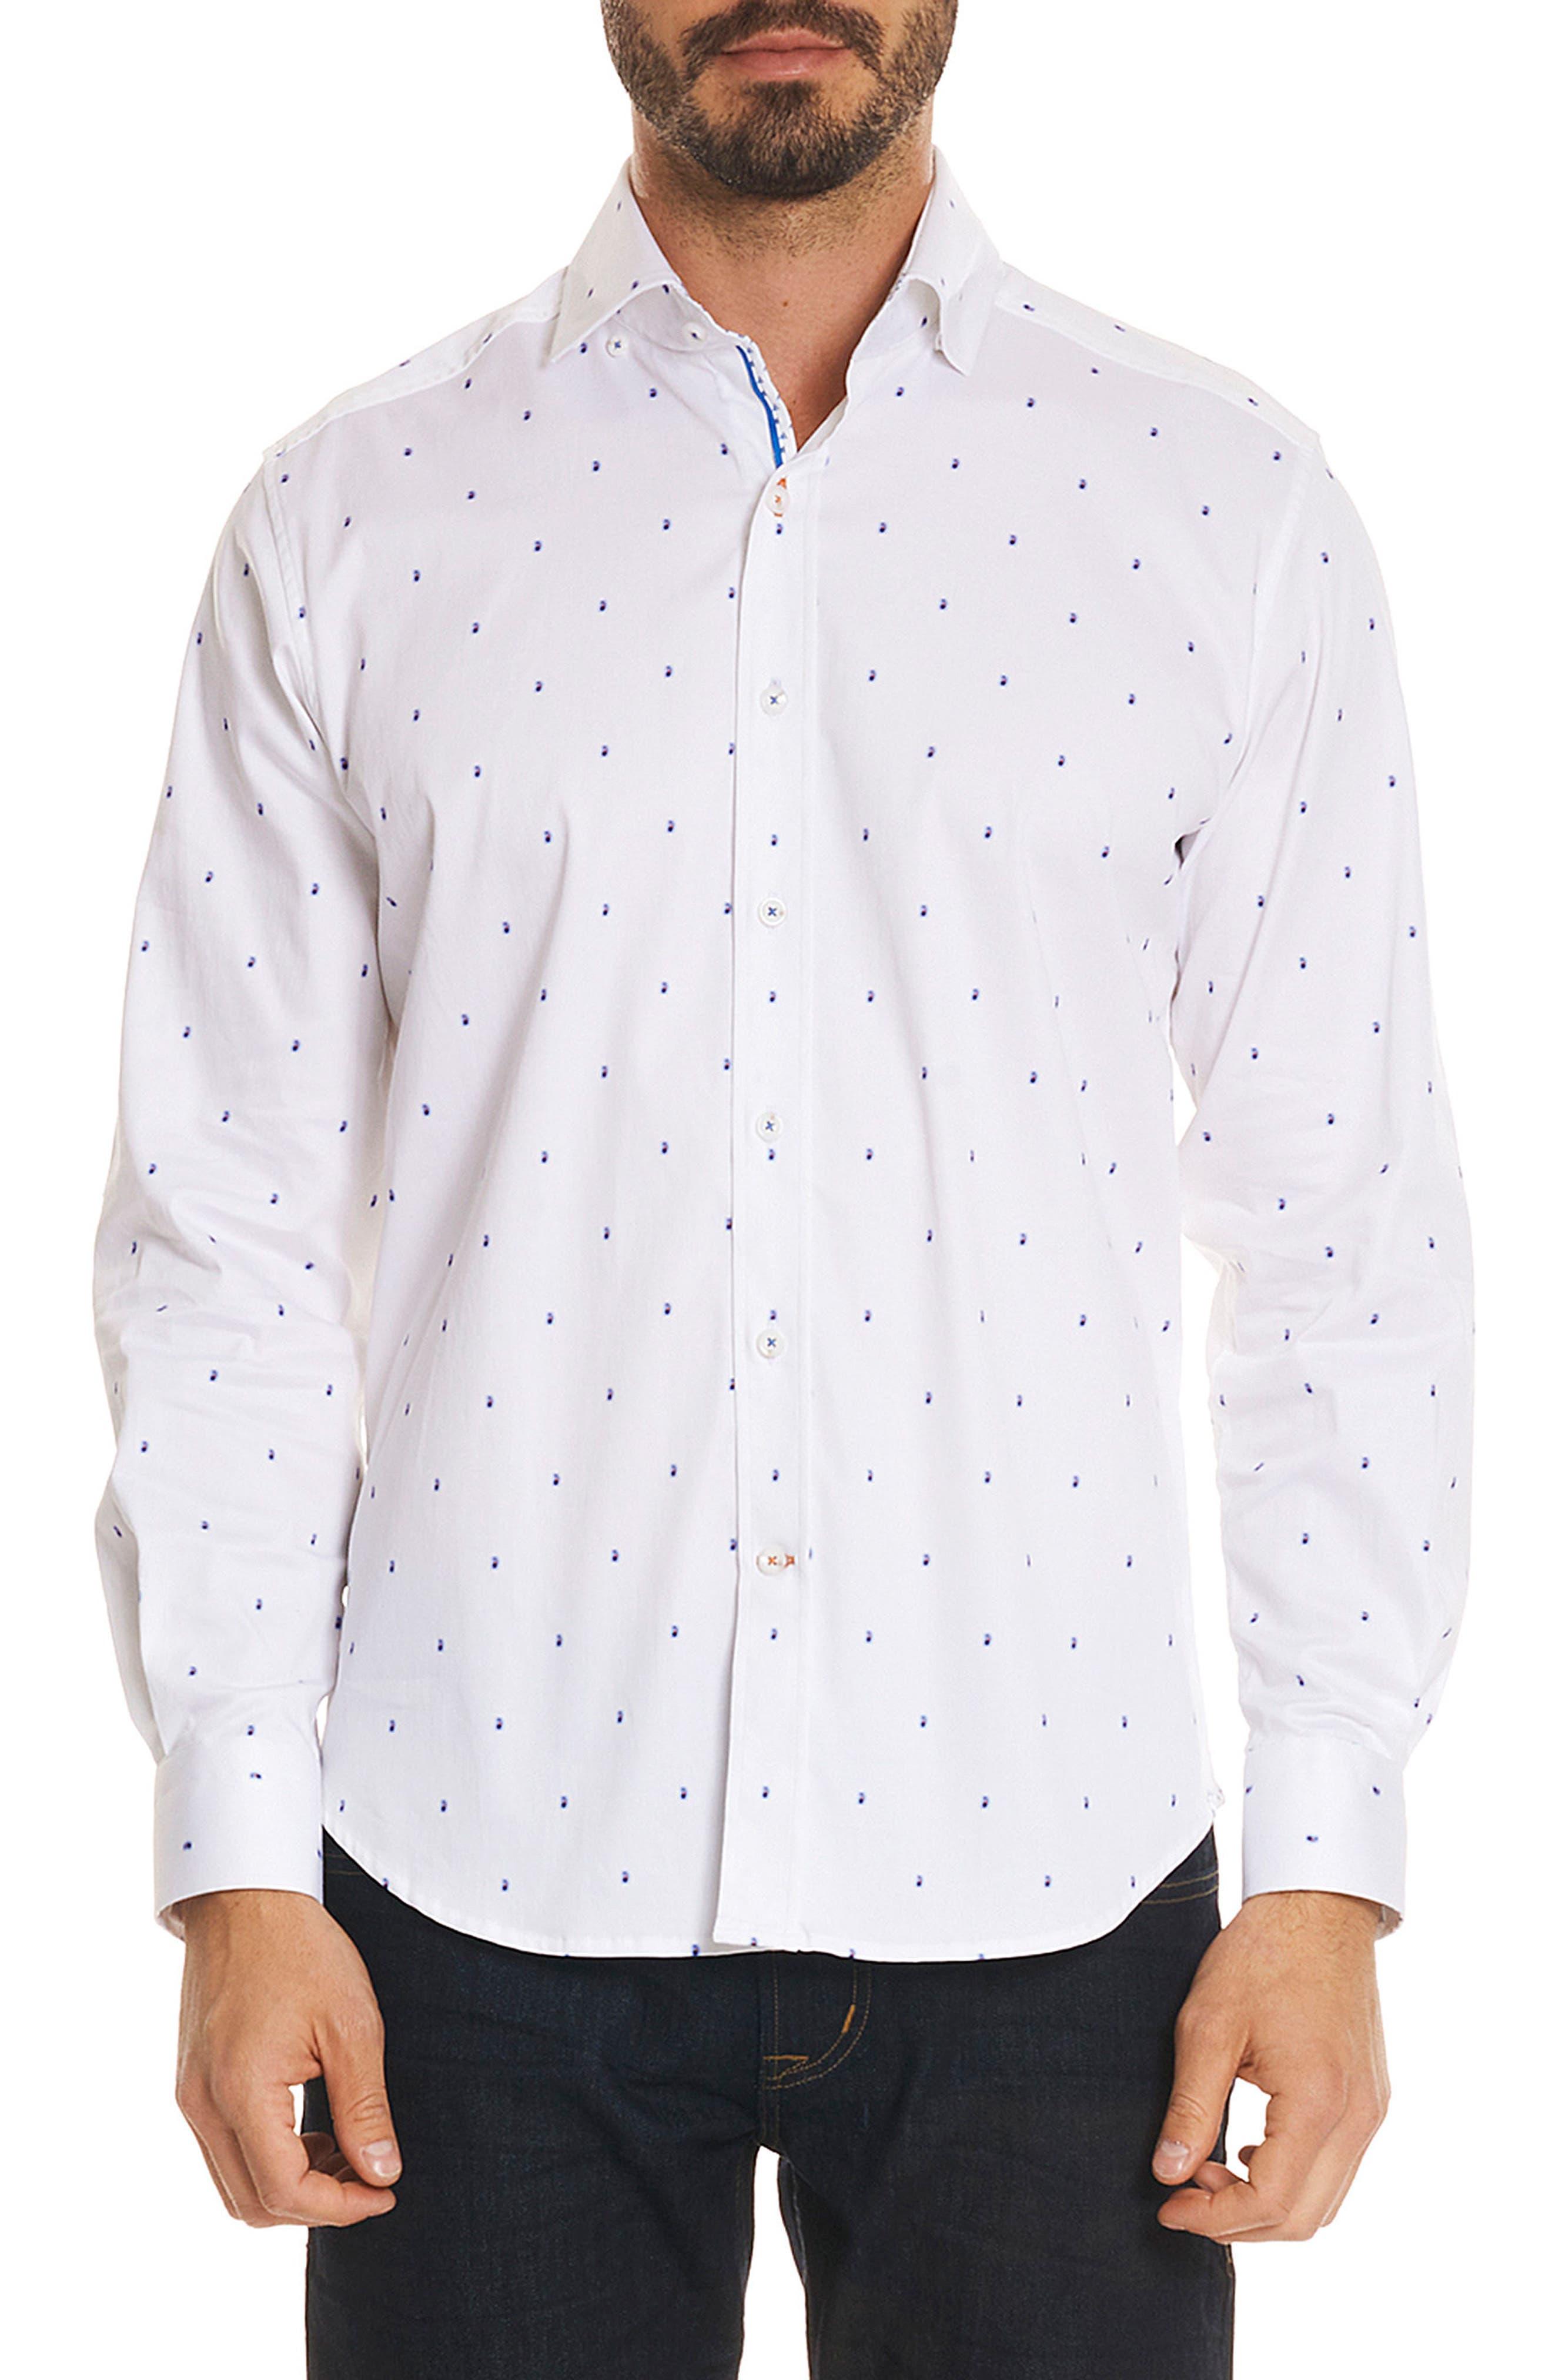 Mack Tailored Fit Sport Shirt,                             Main thumbnail 1, color,                             White